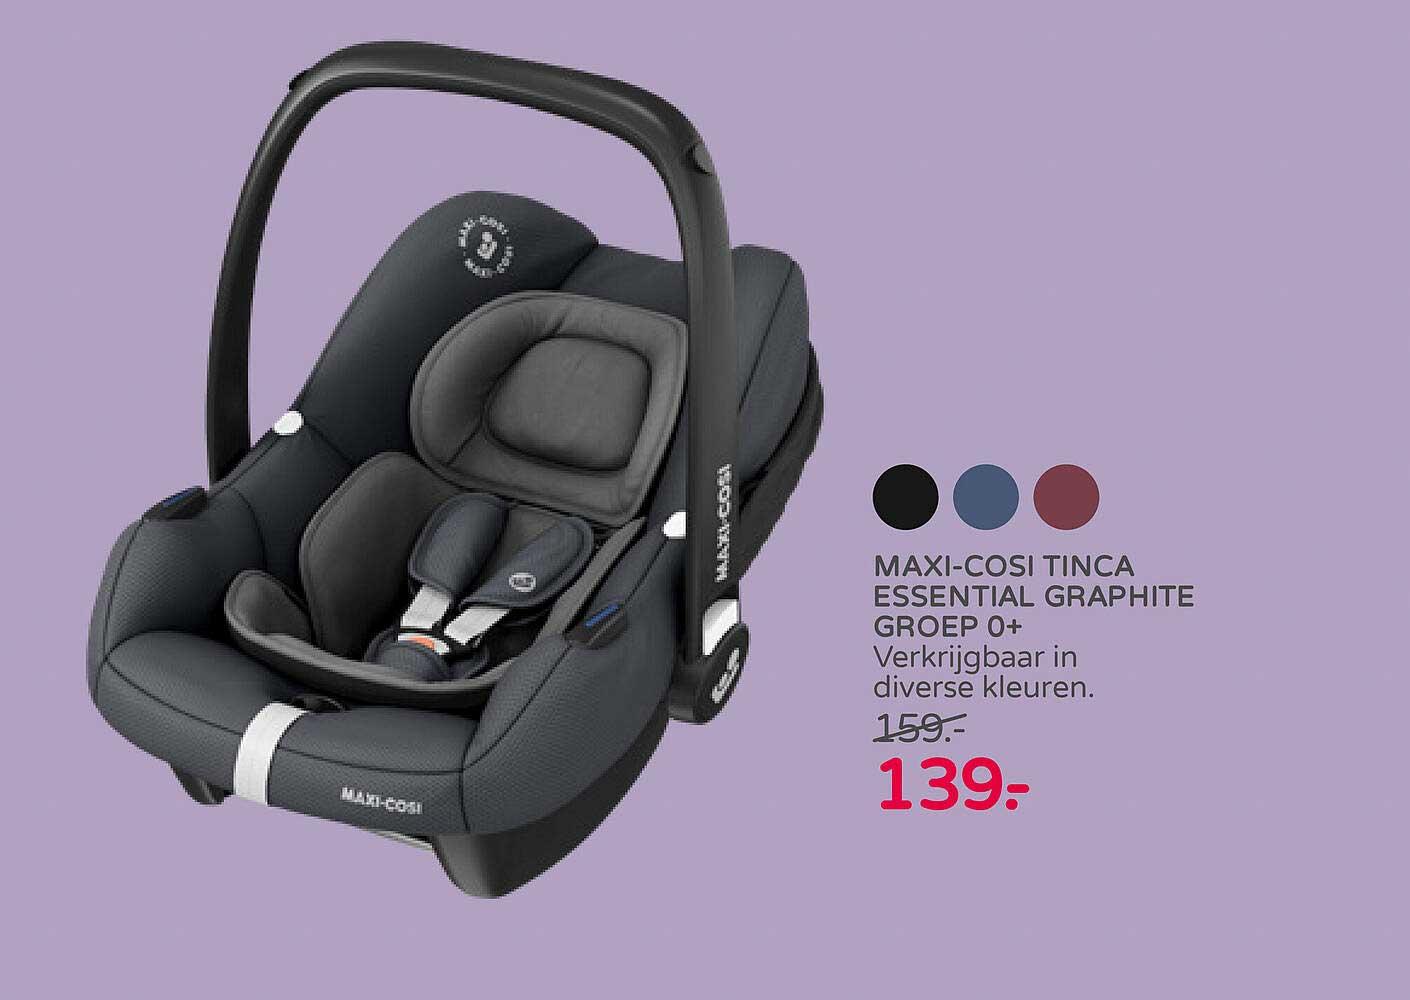 Prénatal Maxi-Cosi Tinca Essential Graphite Groep 0+ Autostoel